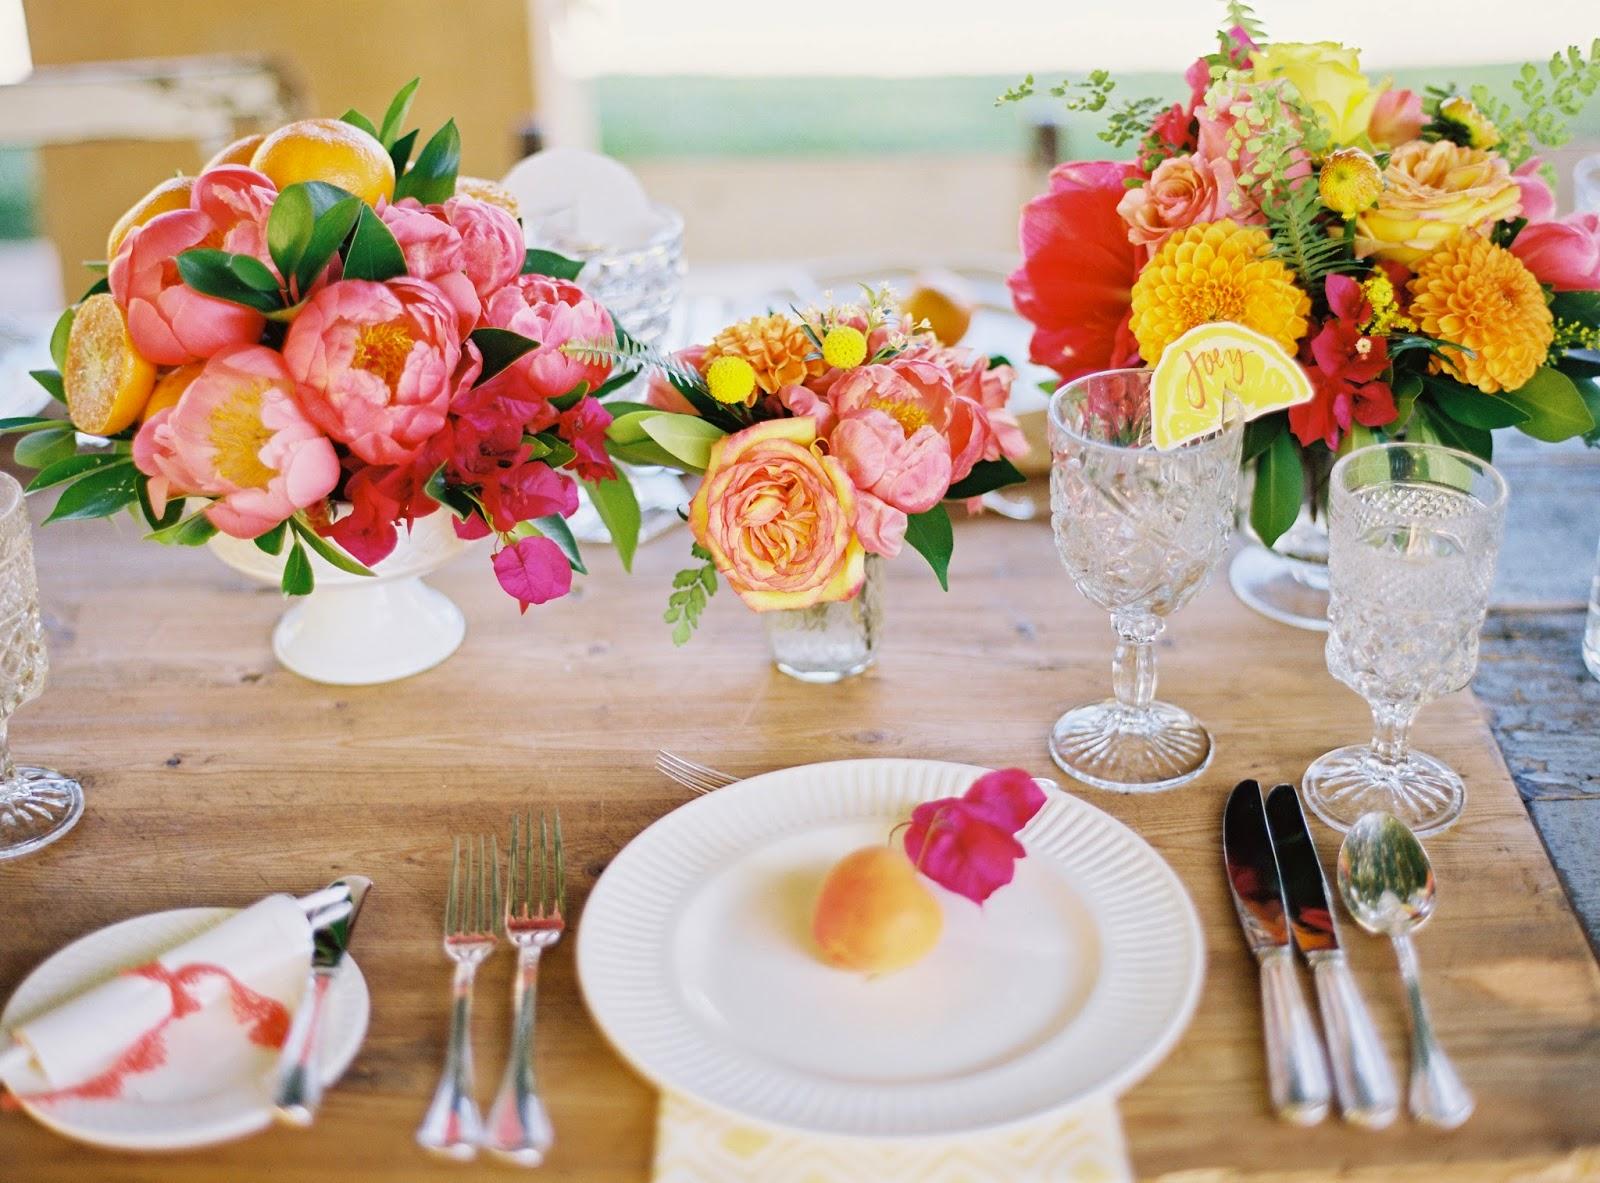 ojai valley inn wedding martha stewart weddings heavenly blooms. Black Bedroom Furniture Sets. Home Design Ideas